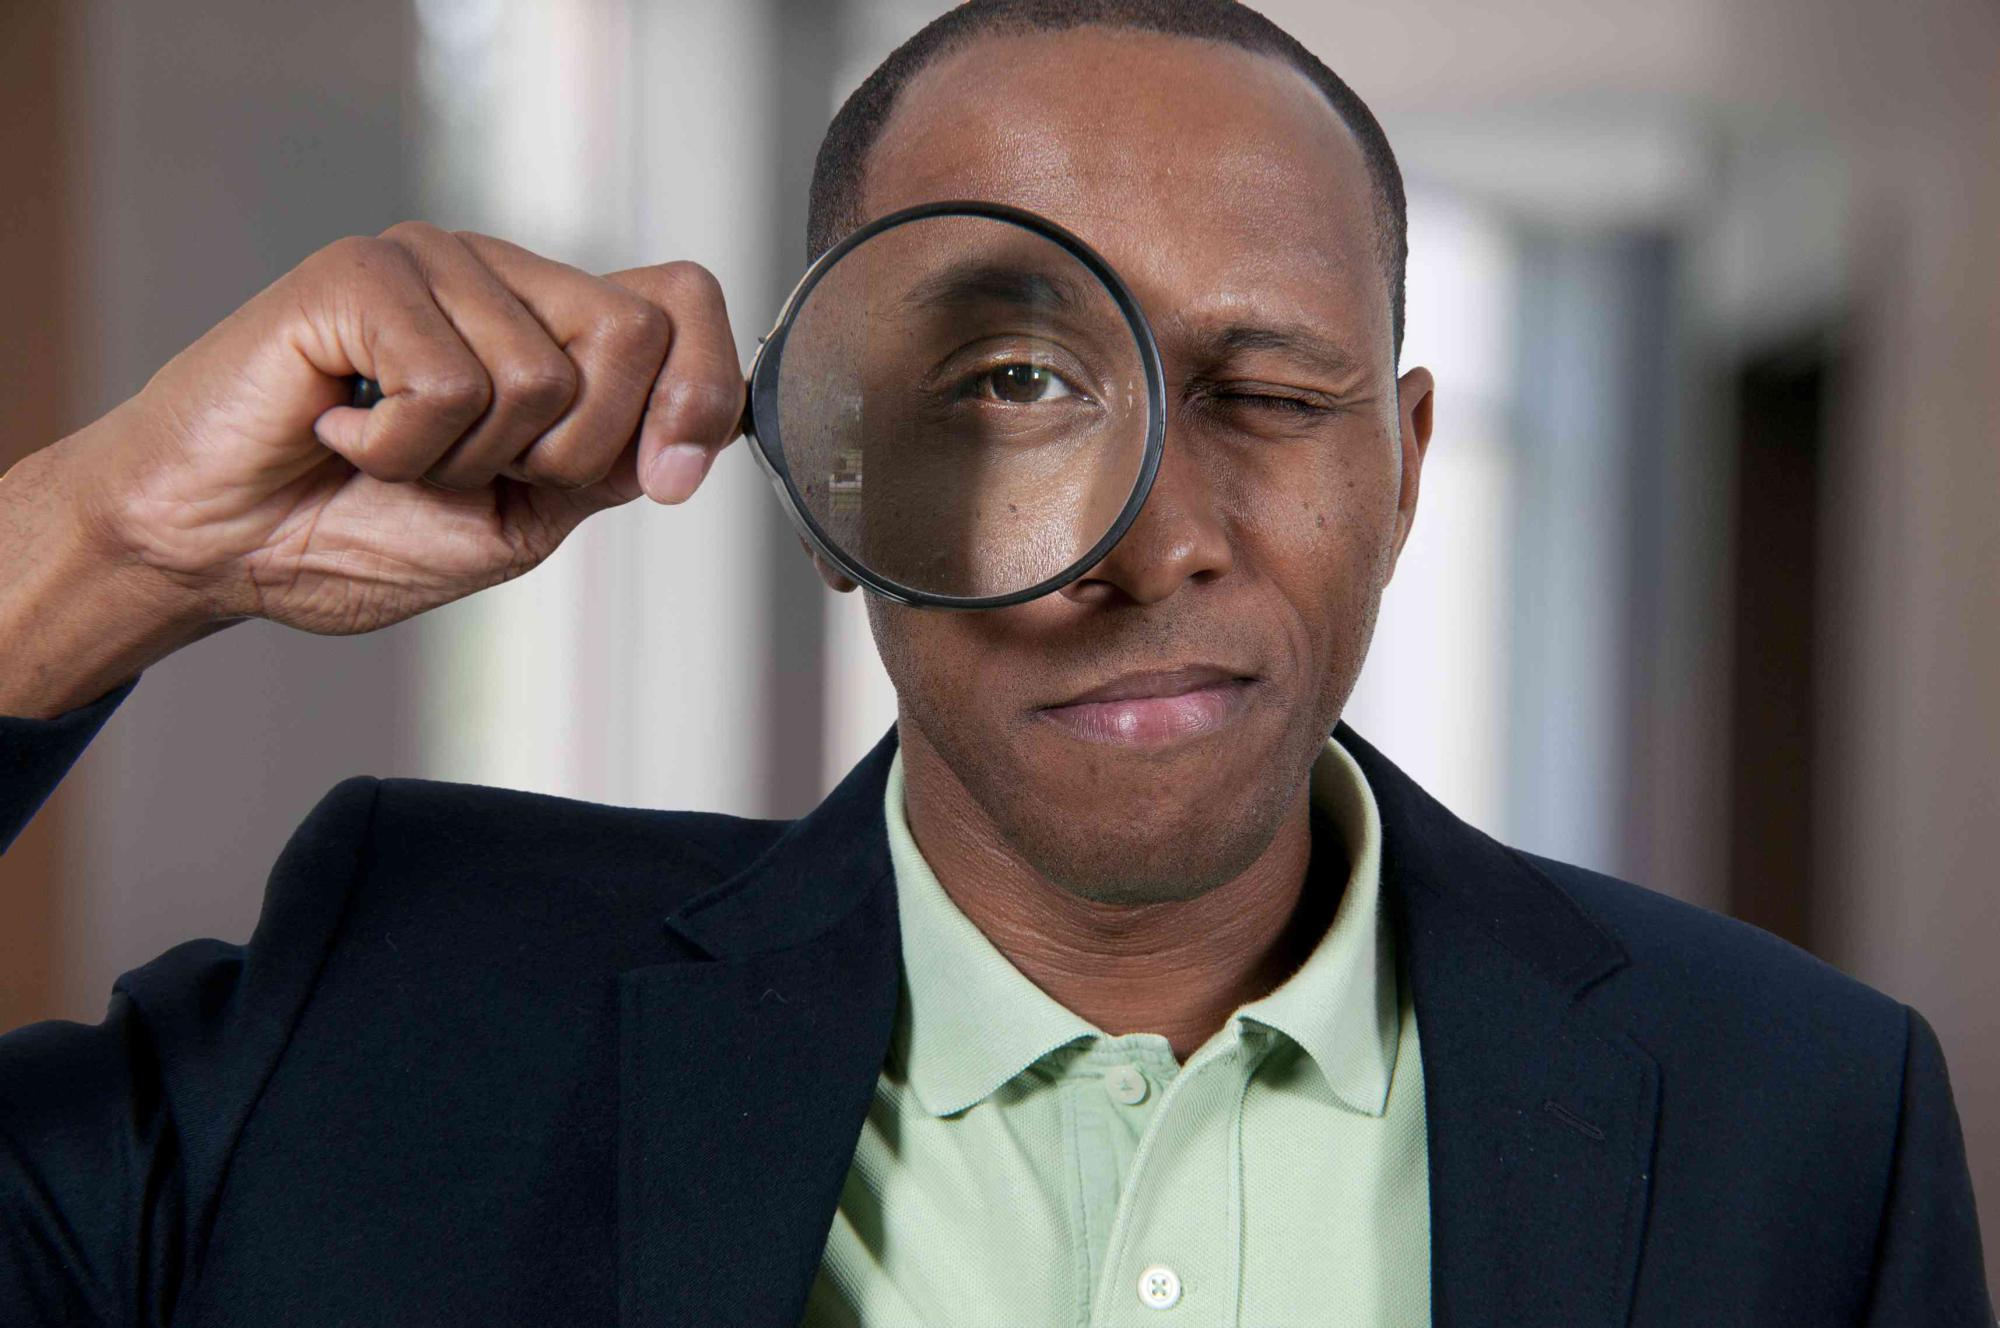 bigstock-Black-Man-Looking-Through-A-Ma-37502563-c-r